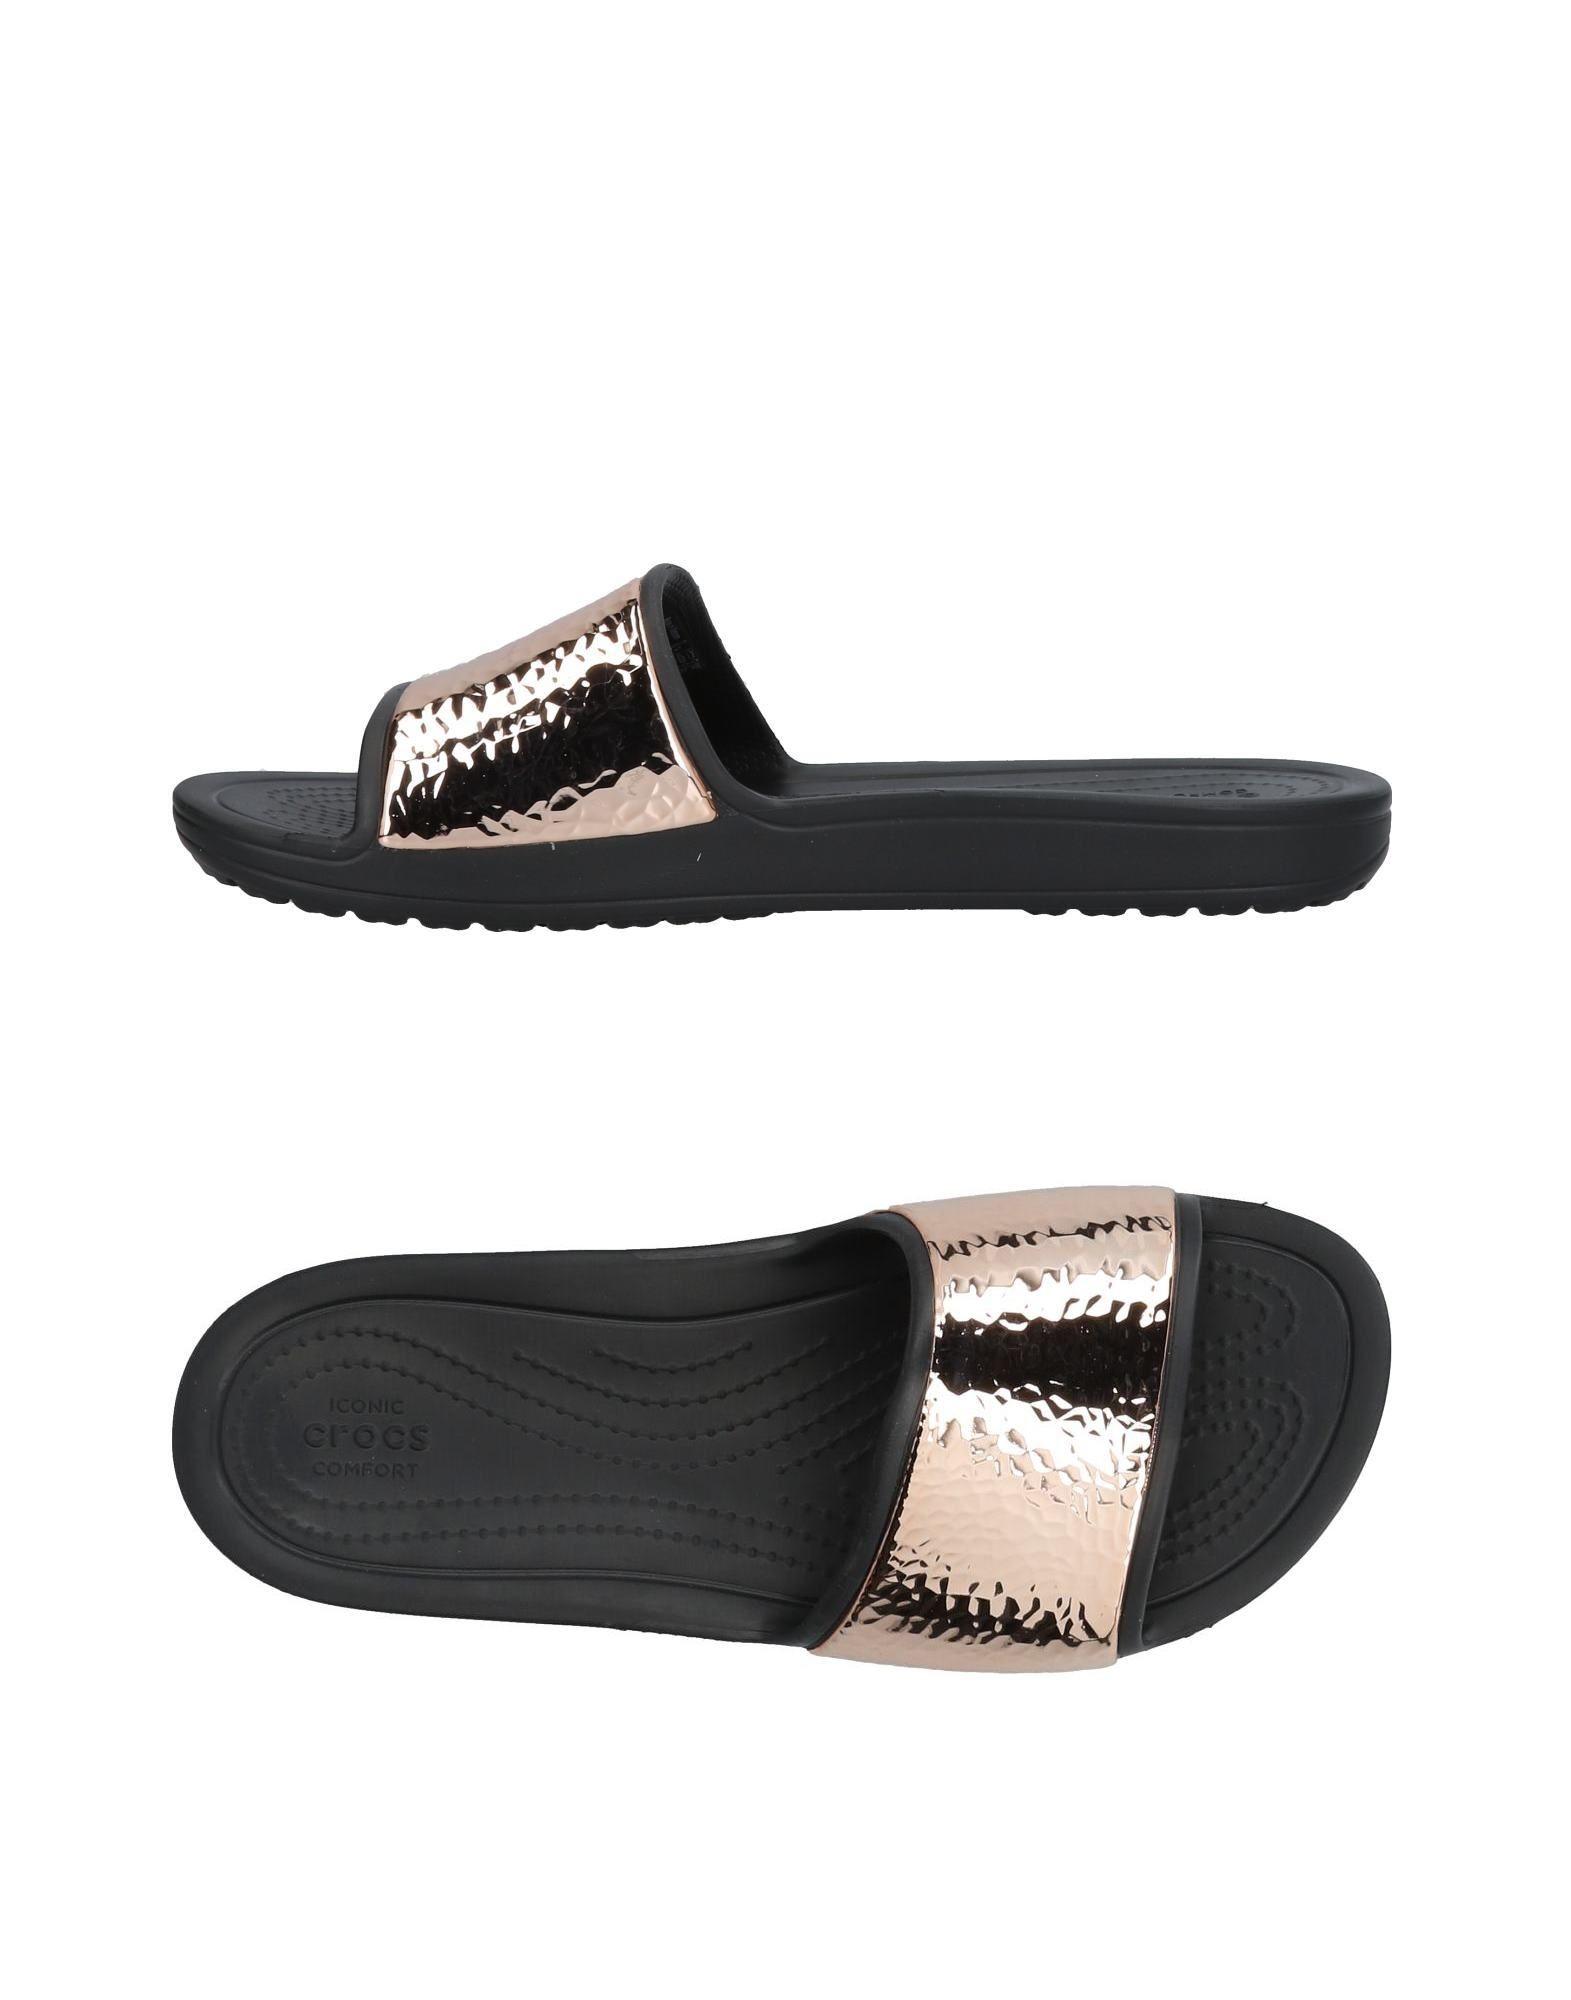 Moda Sandali Crocs Donna - 11442399PP